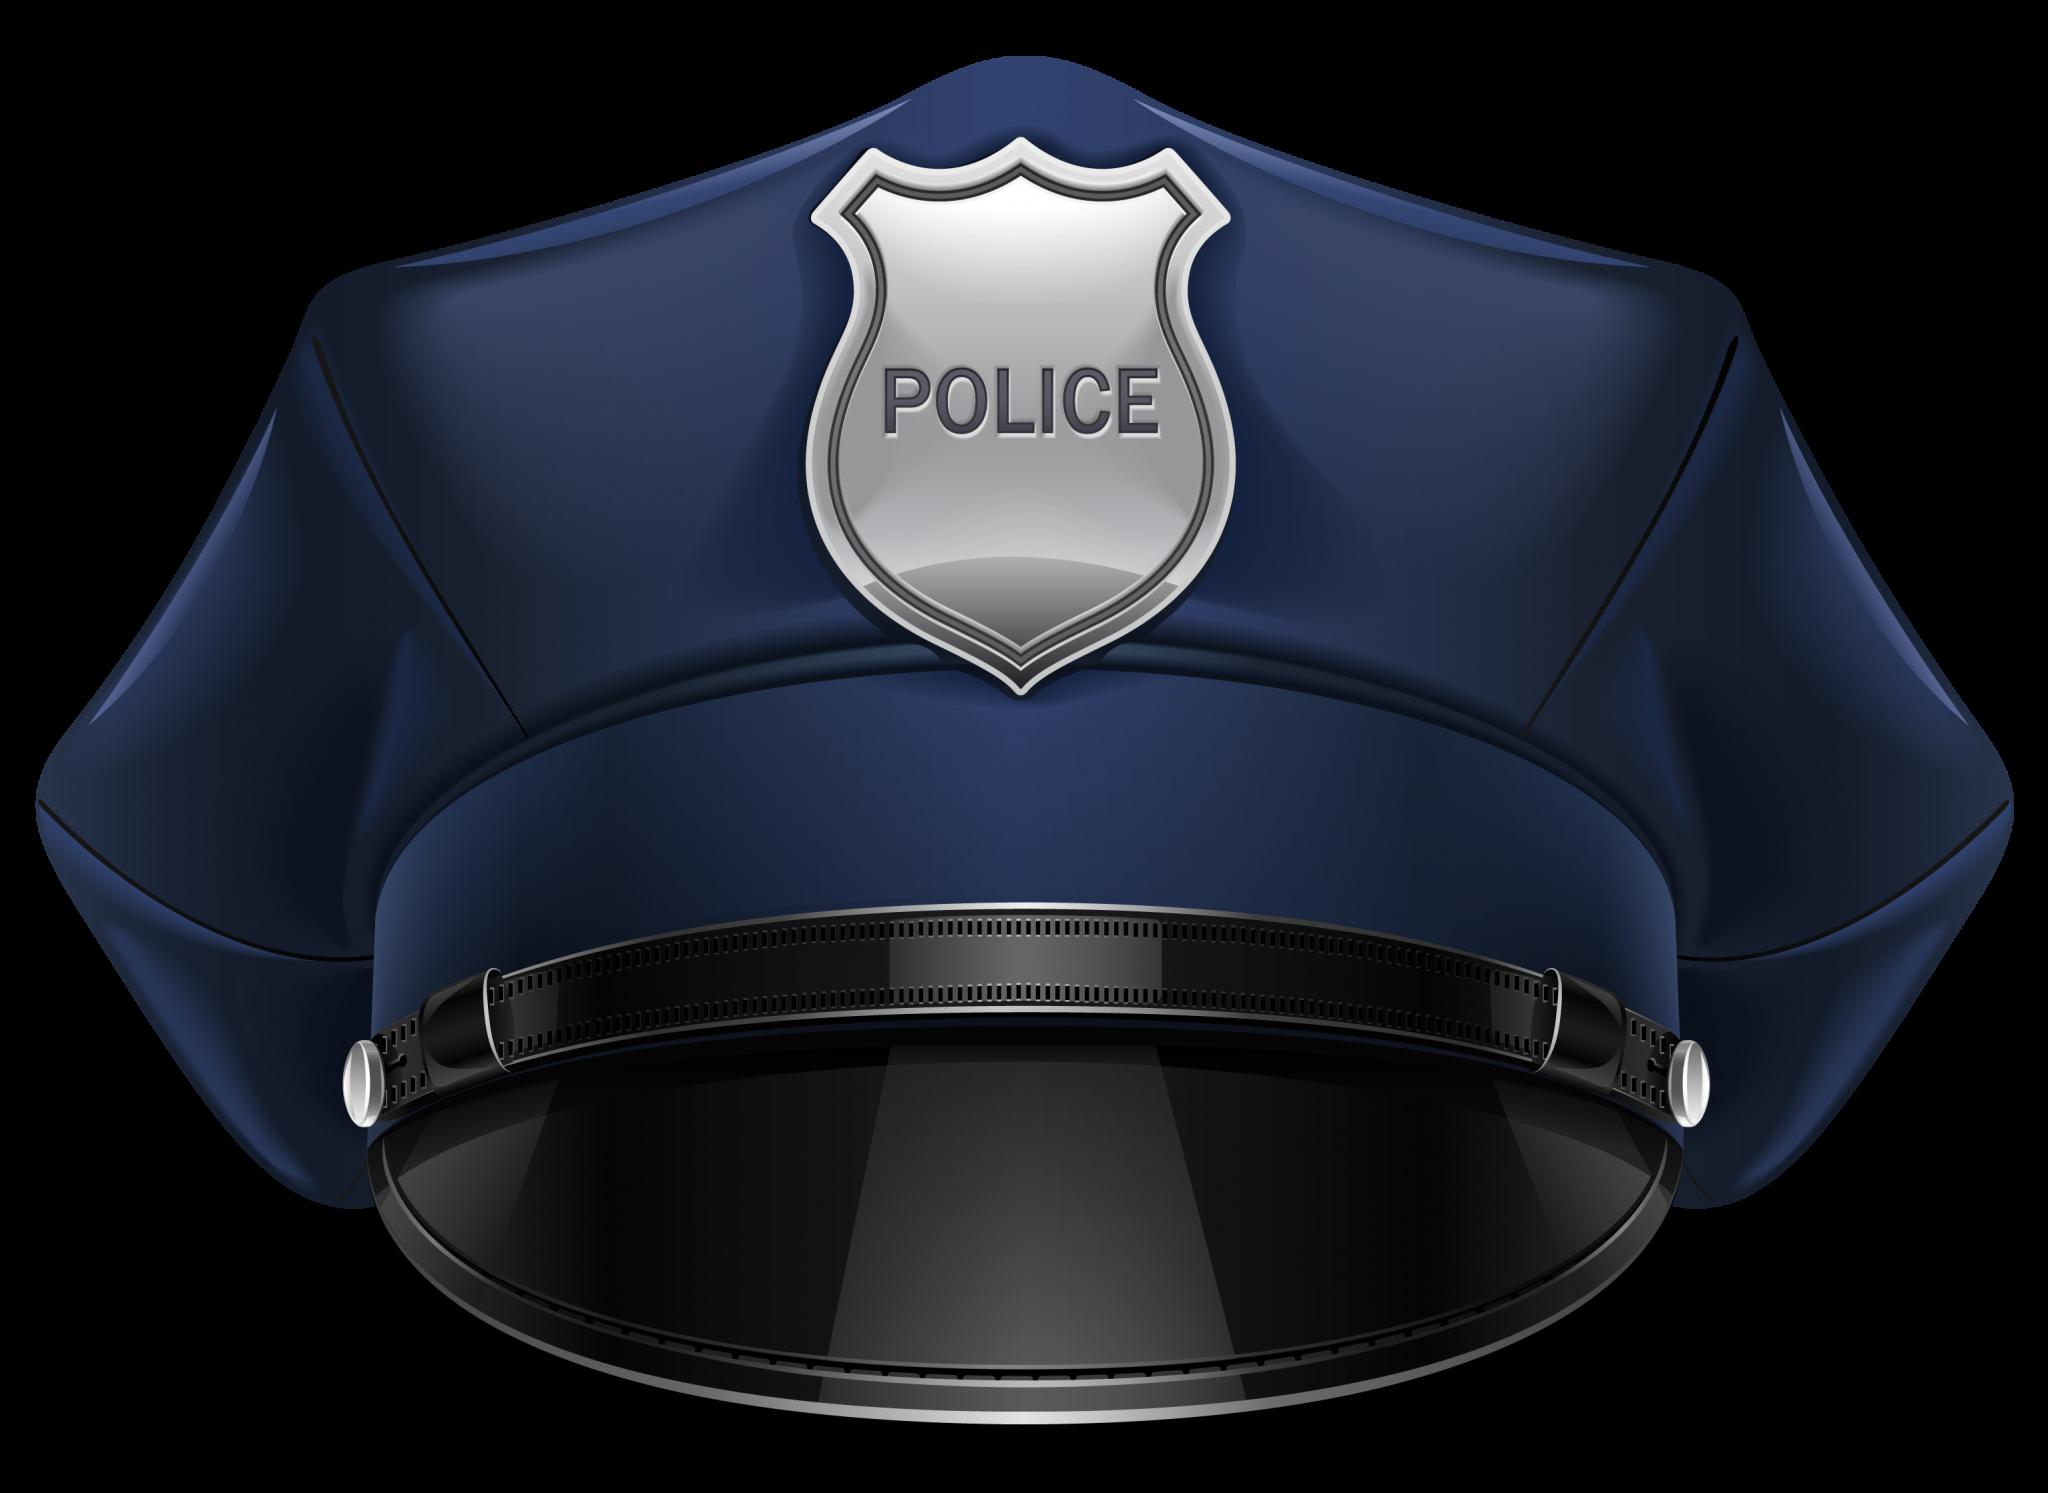 Police wallpaper desktop backgrounds. Clipart mustache man's hat